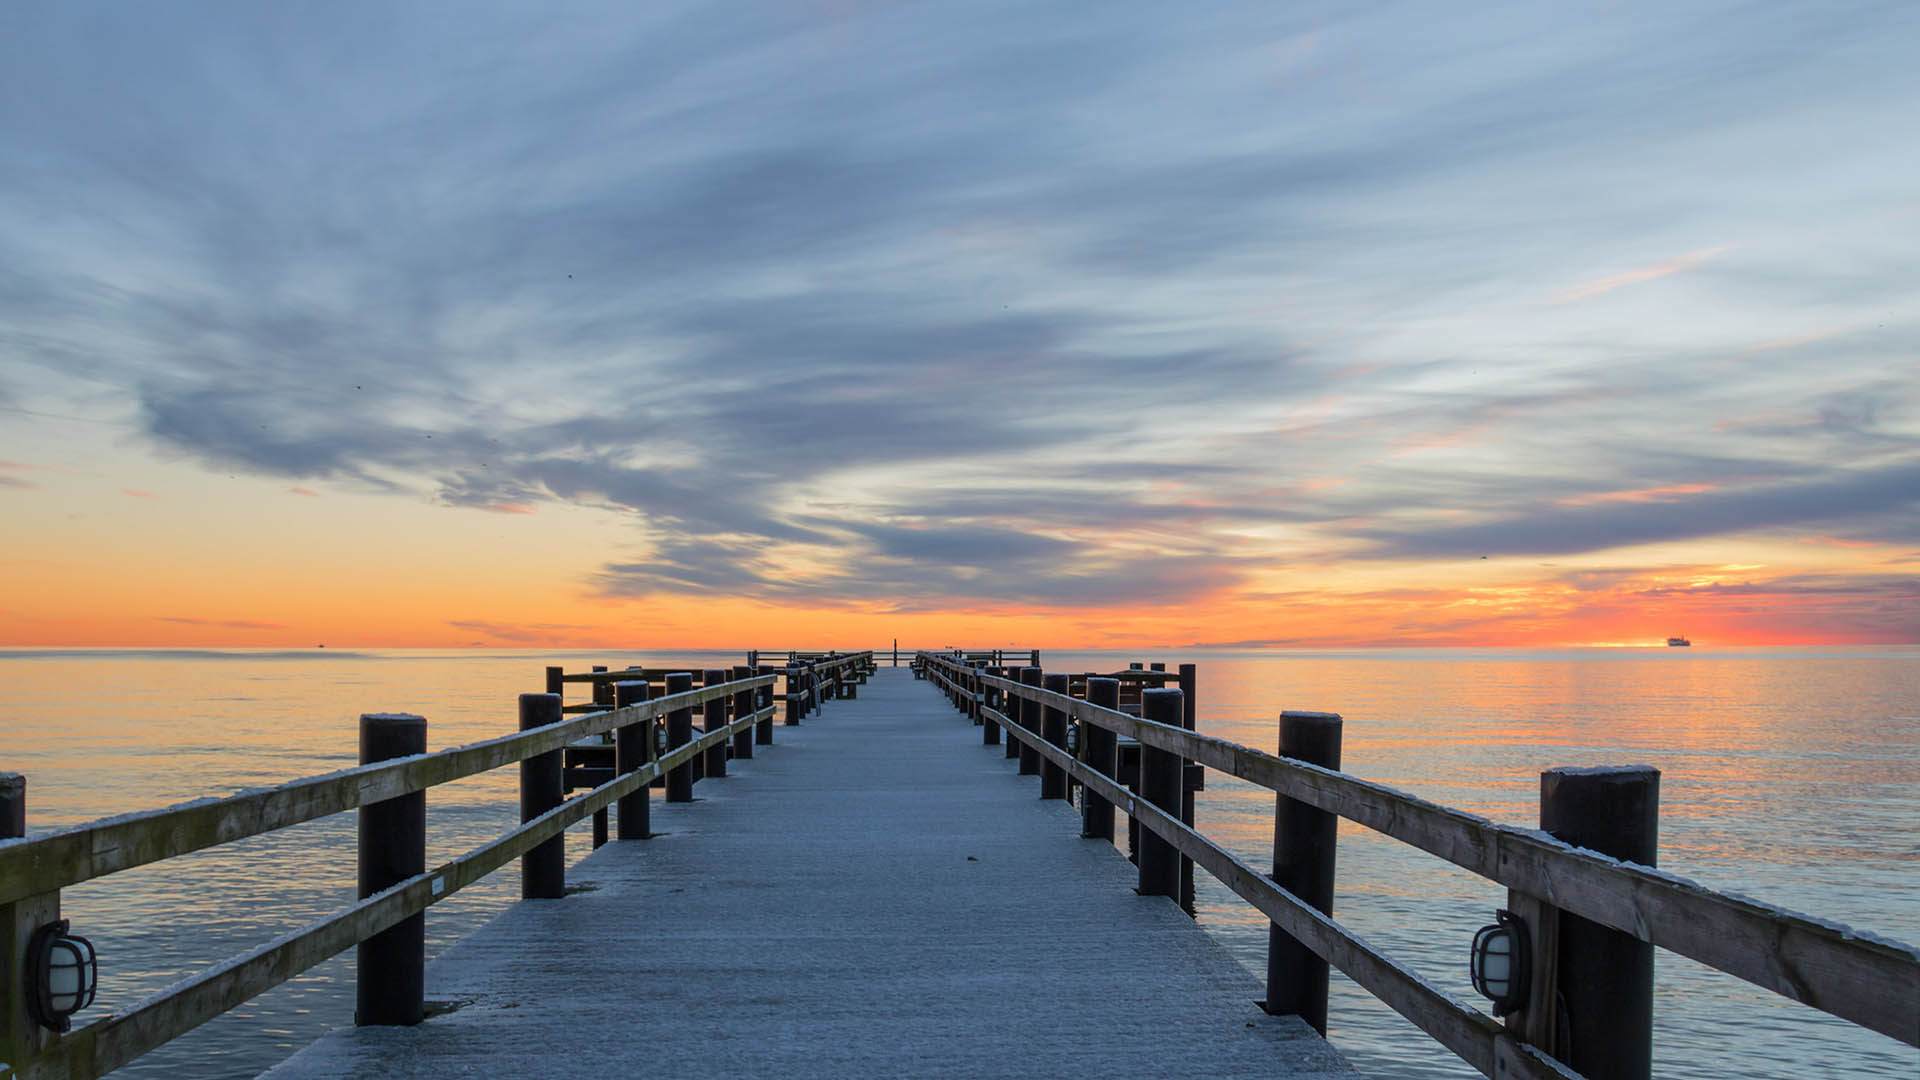 Meditation und Seelenbilderreise - Steg ins Meer